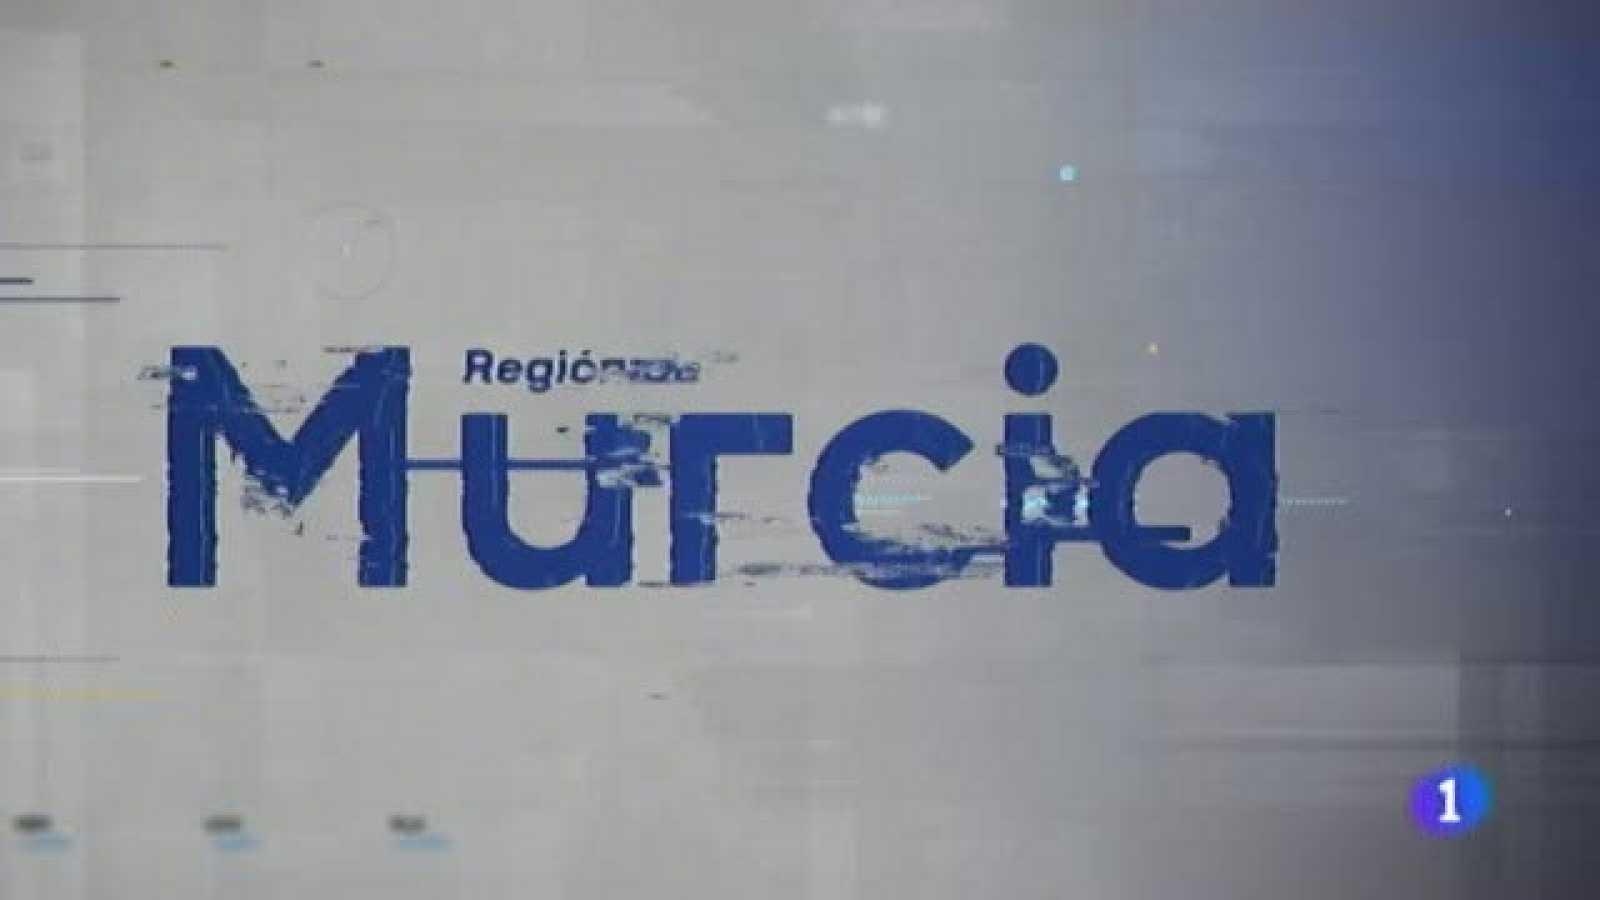 Noticias Murcia - 28/04/2021